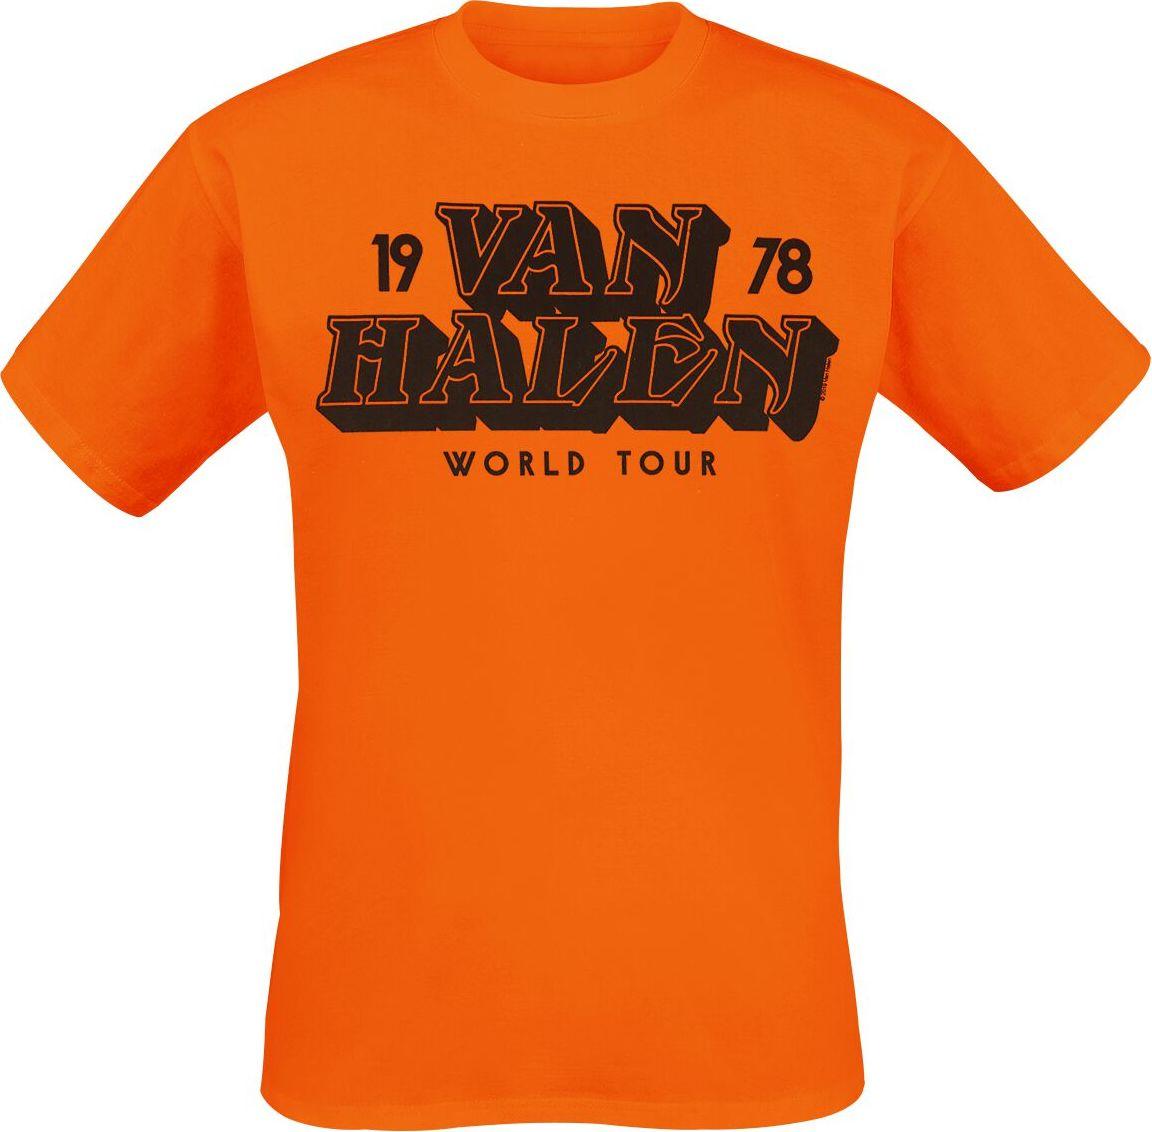 Van Halen Tour 1978 tricko oranžová